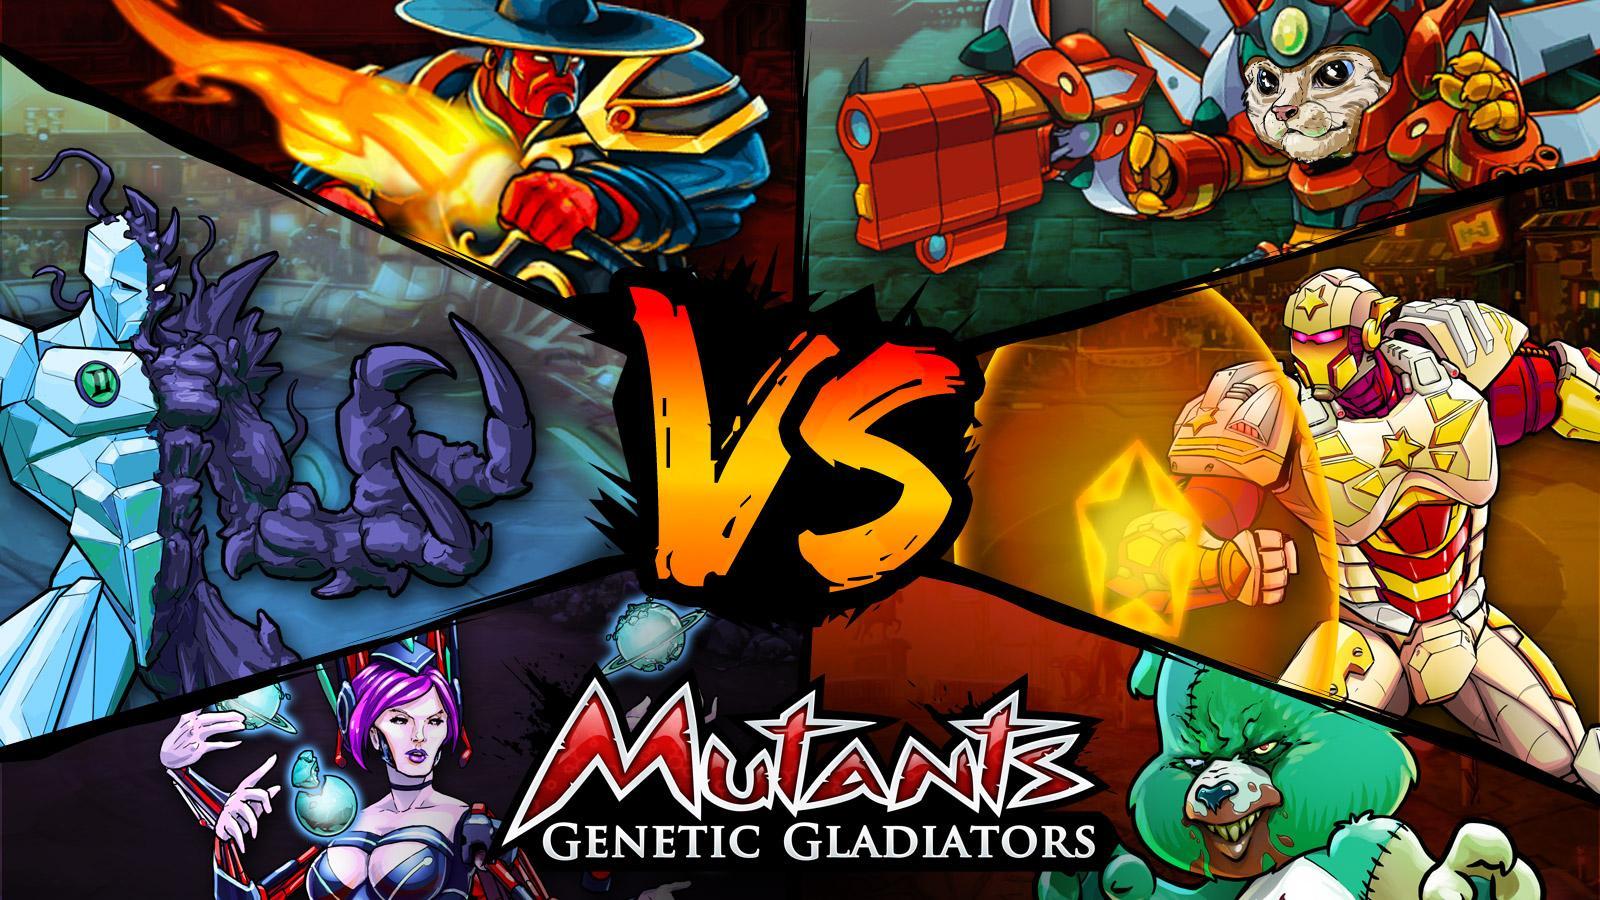 Screenshots of Mutants Genetic Gladiators for iPhone